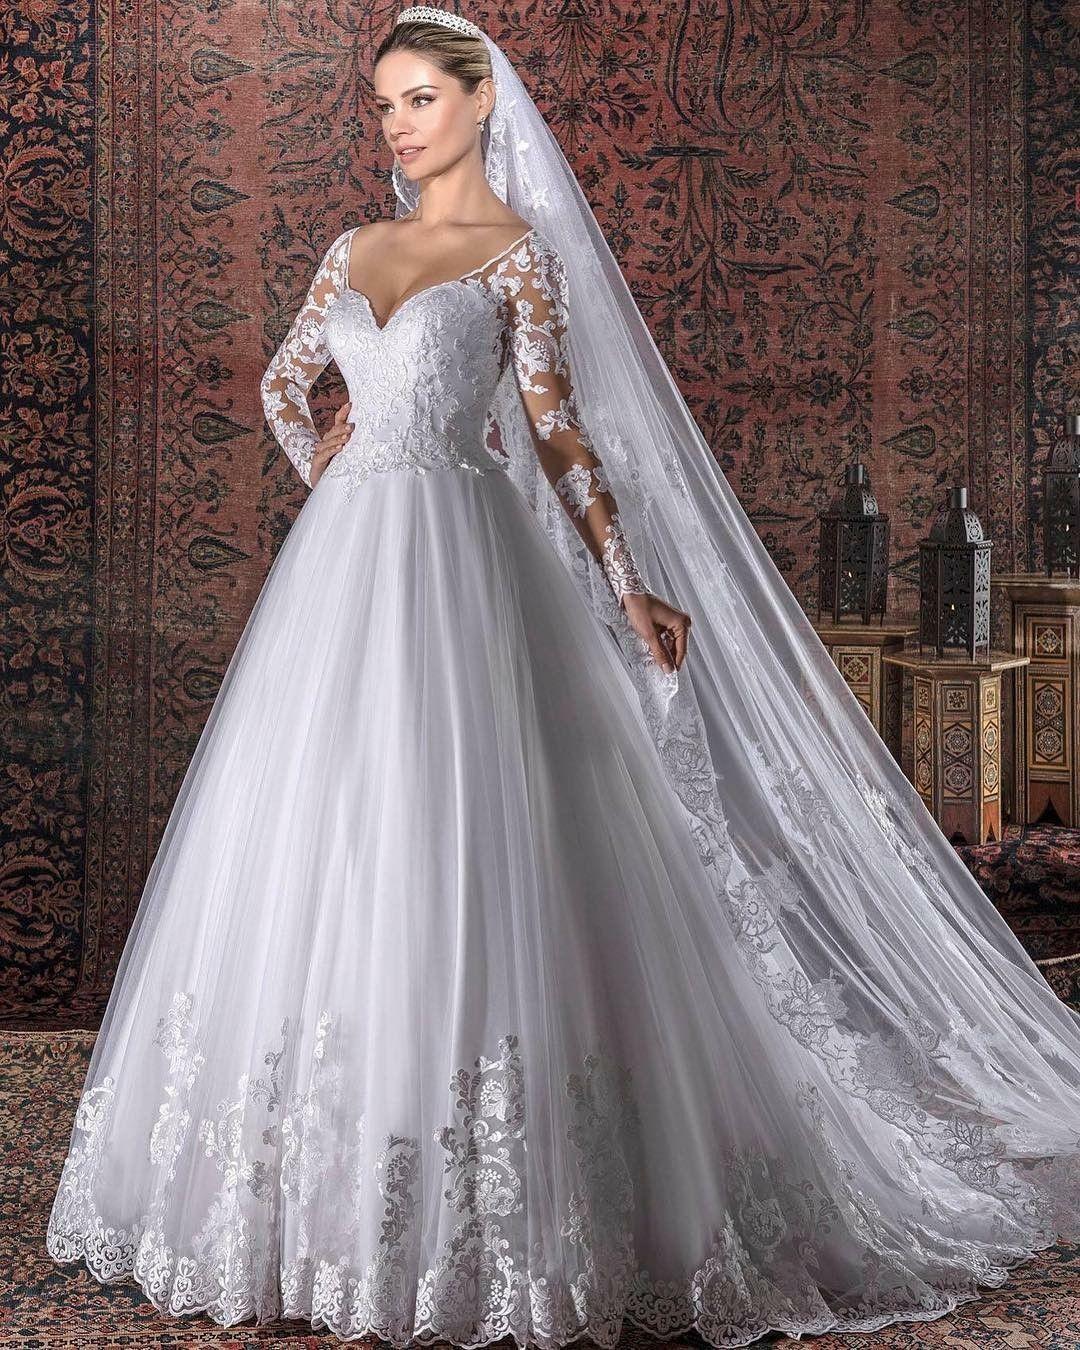 Pin By Lynn Marie On Gowns Bridal Dress Stores Bridal Dresses Wedding Dress Fabrics